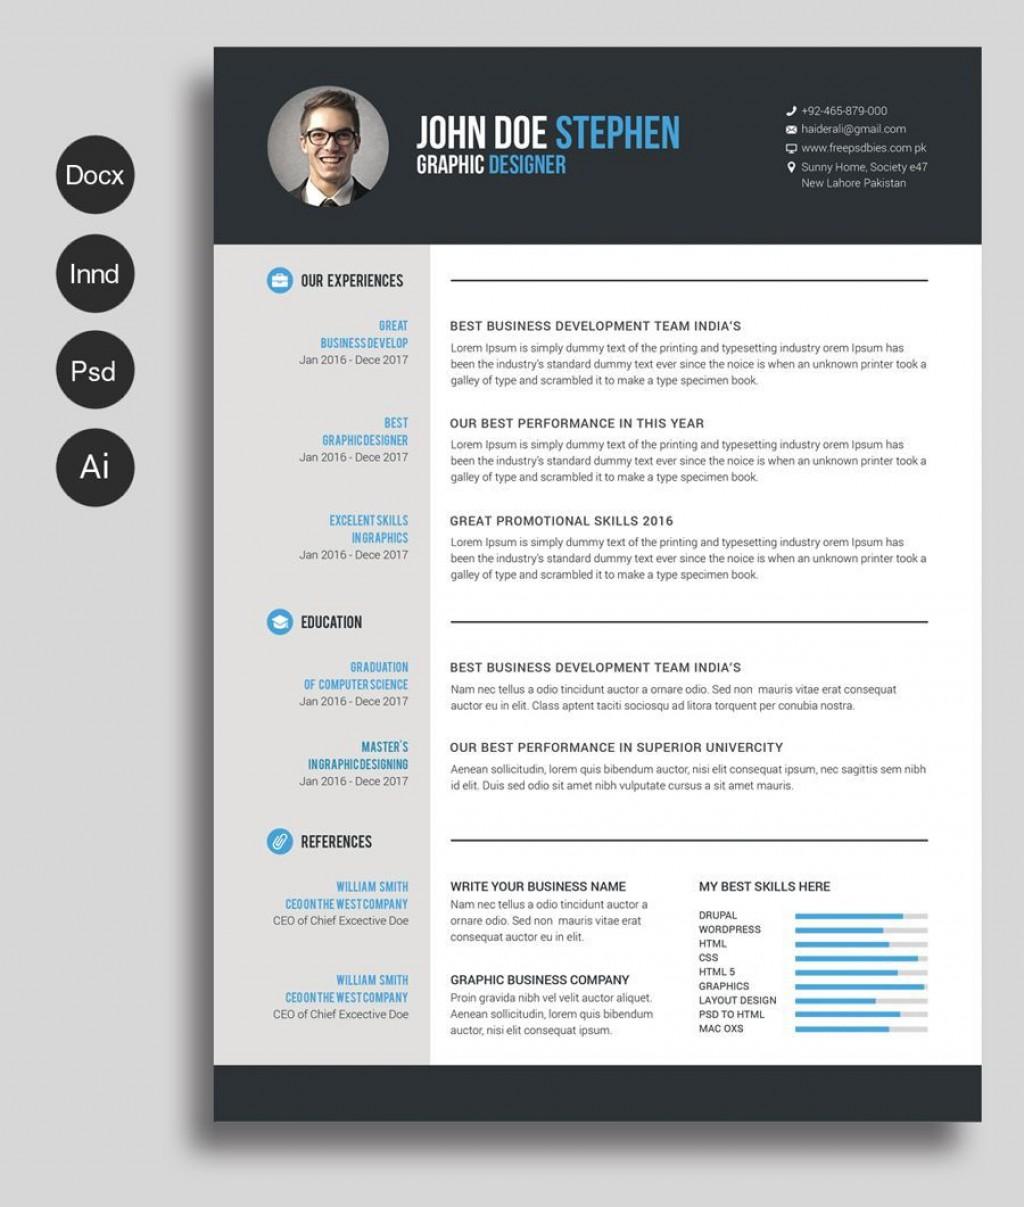 001 Top Free Resume Template Microsoft Word 2010 High Def  Cv DownloadLarge